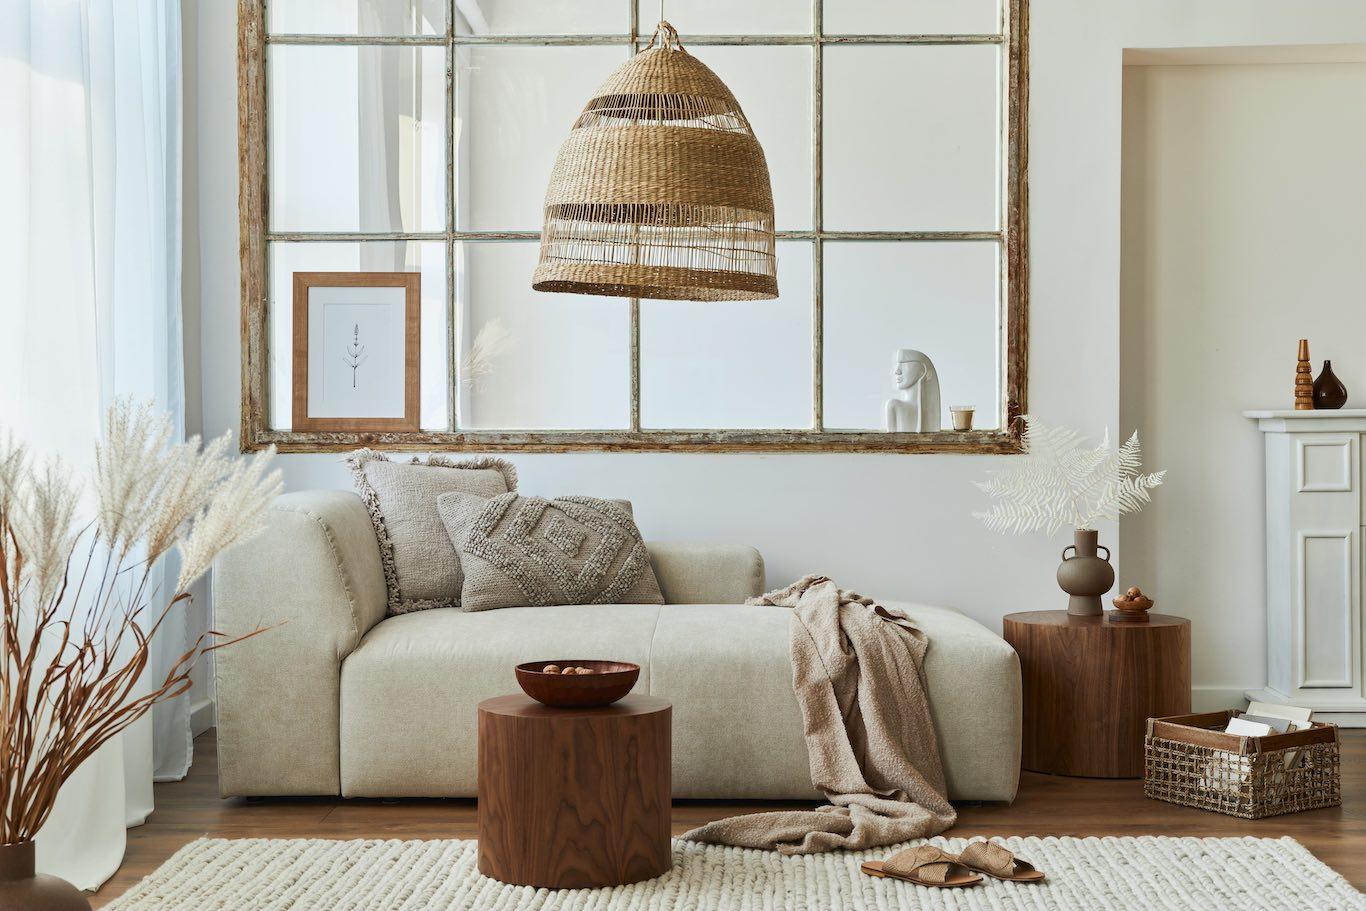 Ide Dekorasi Kamar Estetik Serasa Staycation Setiap Hari